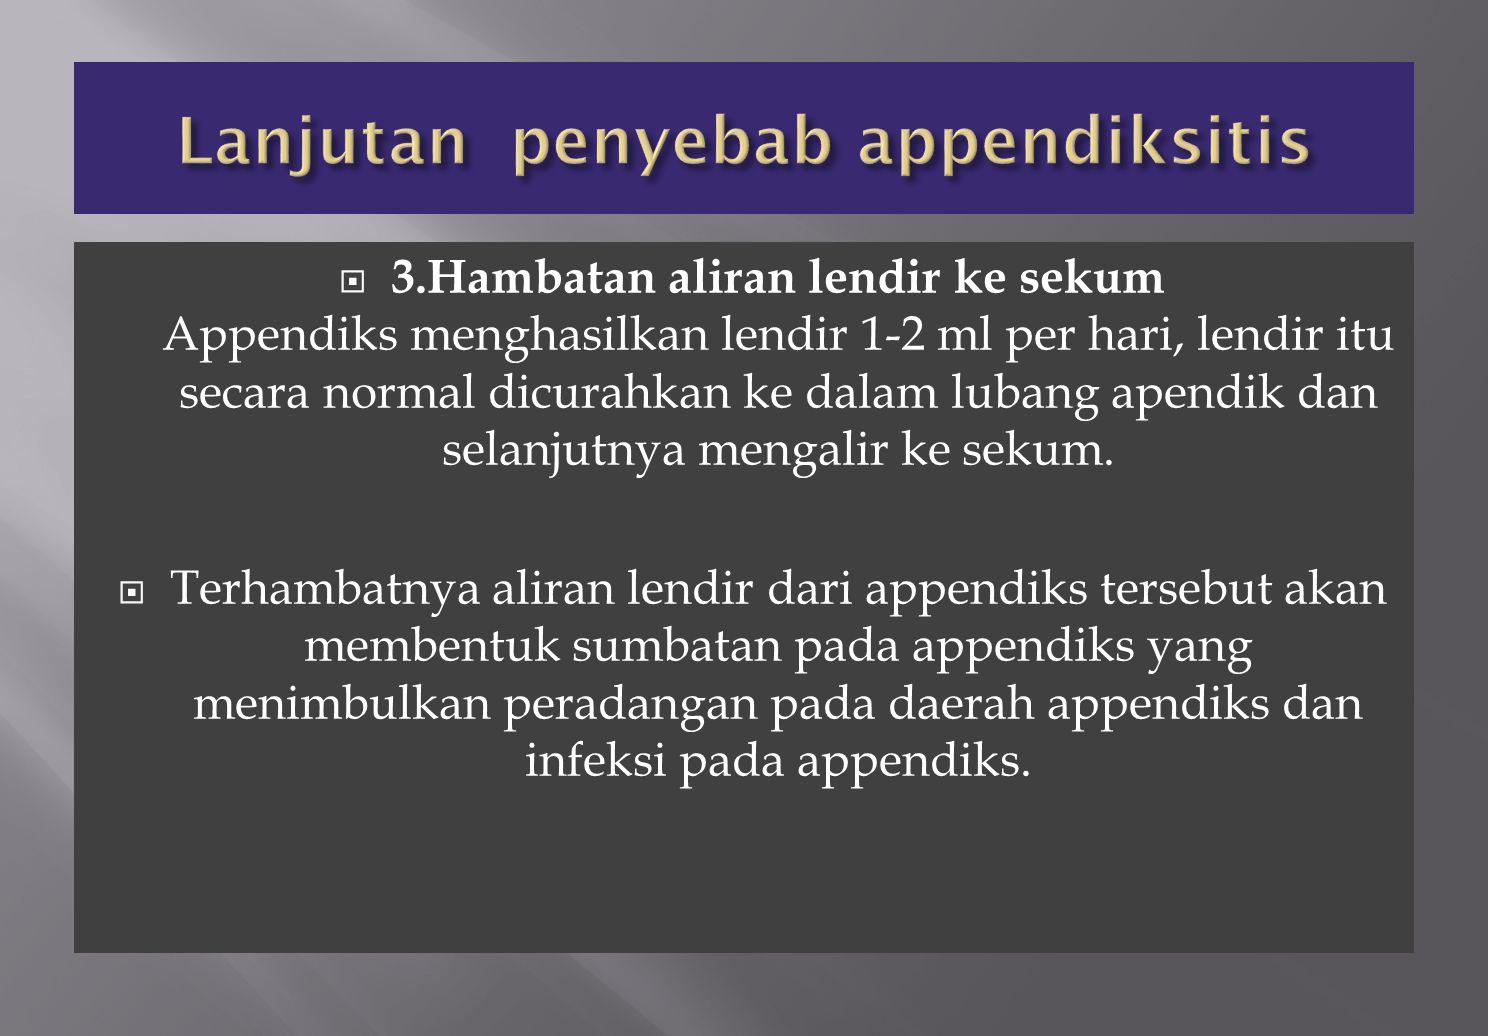  3.Hambatan aliran lendir ke sekum Appendiks menghasilkan lendir 1-2 ml per hari, lendir itu secara normal dicurahkan ke dalam lubang apendik dan sel